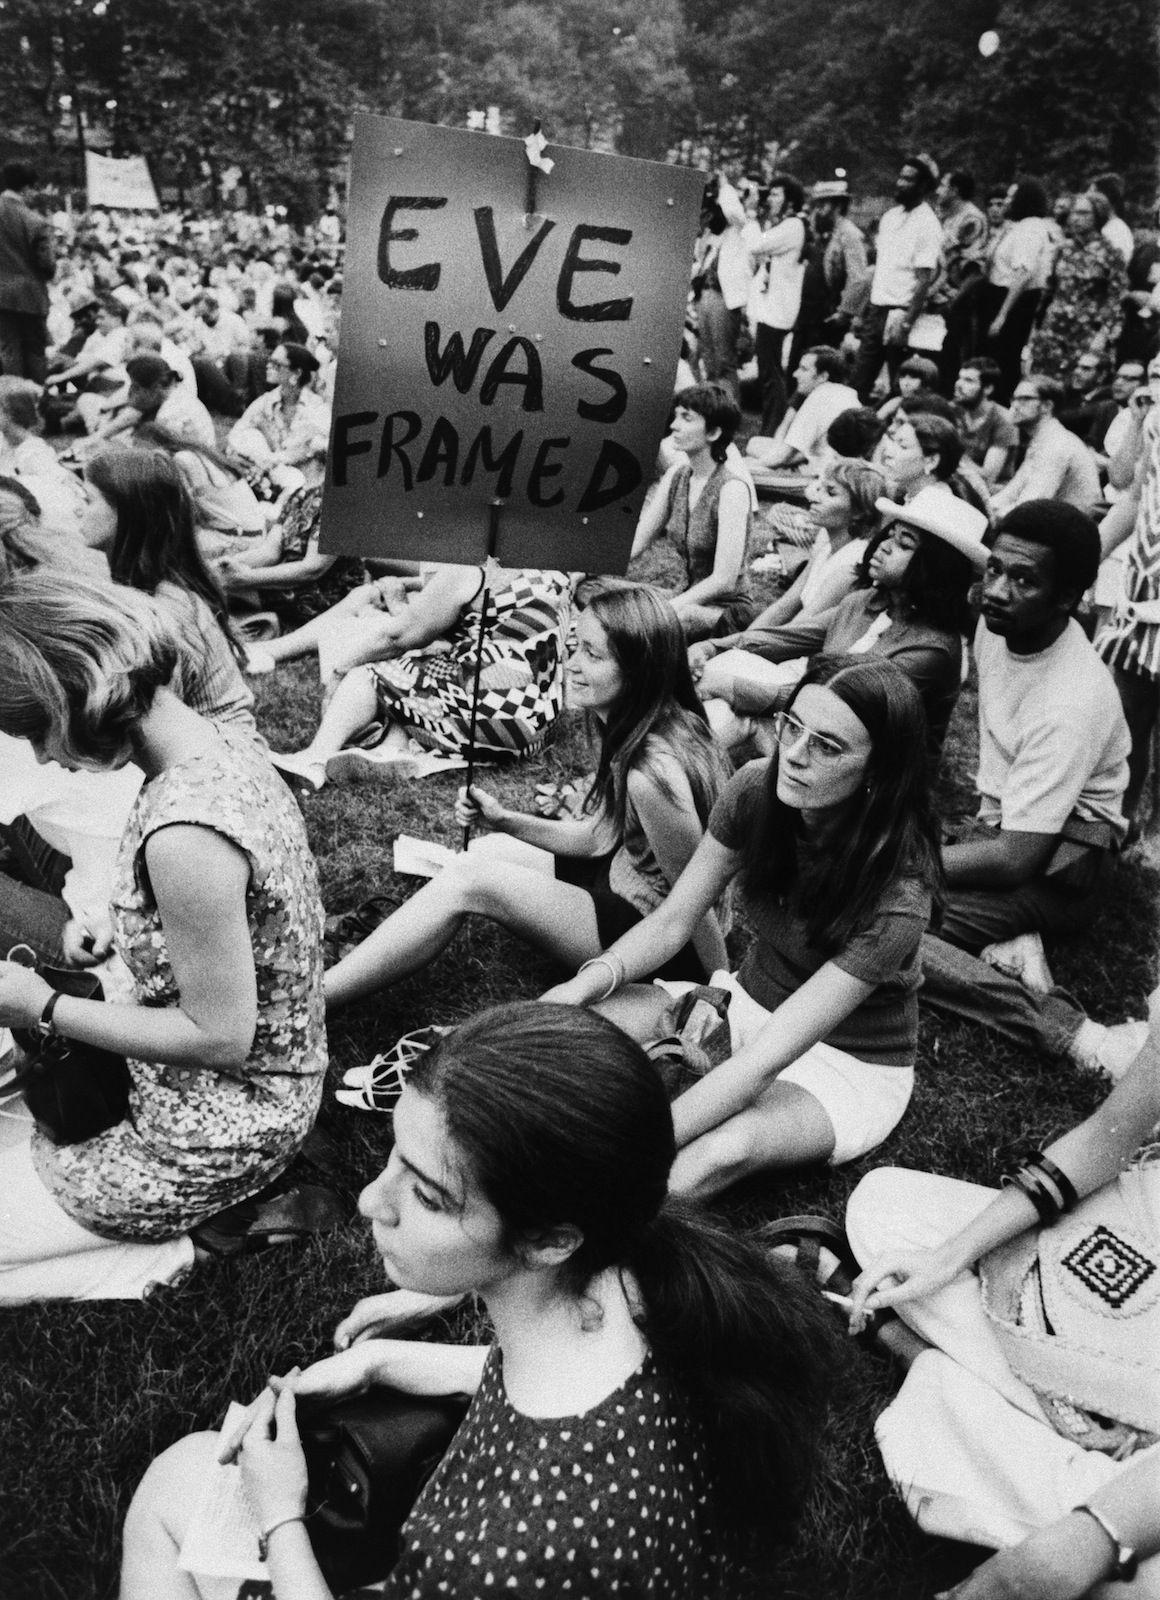 """eve Framed"" Of Mottos -wave Feminist Movement Women"